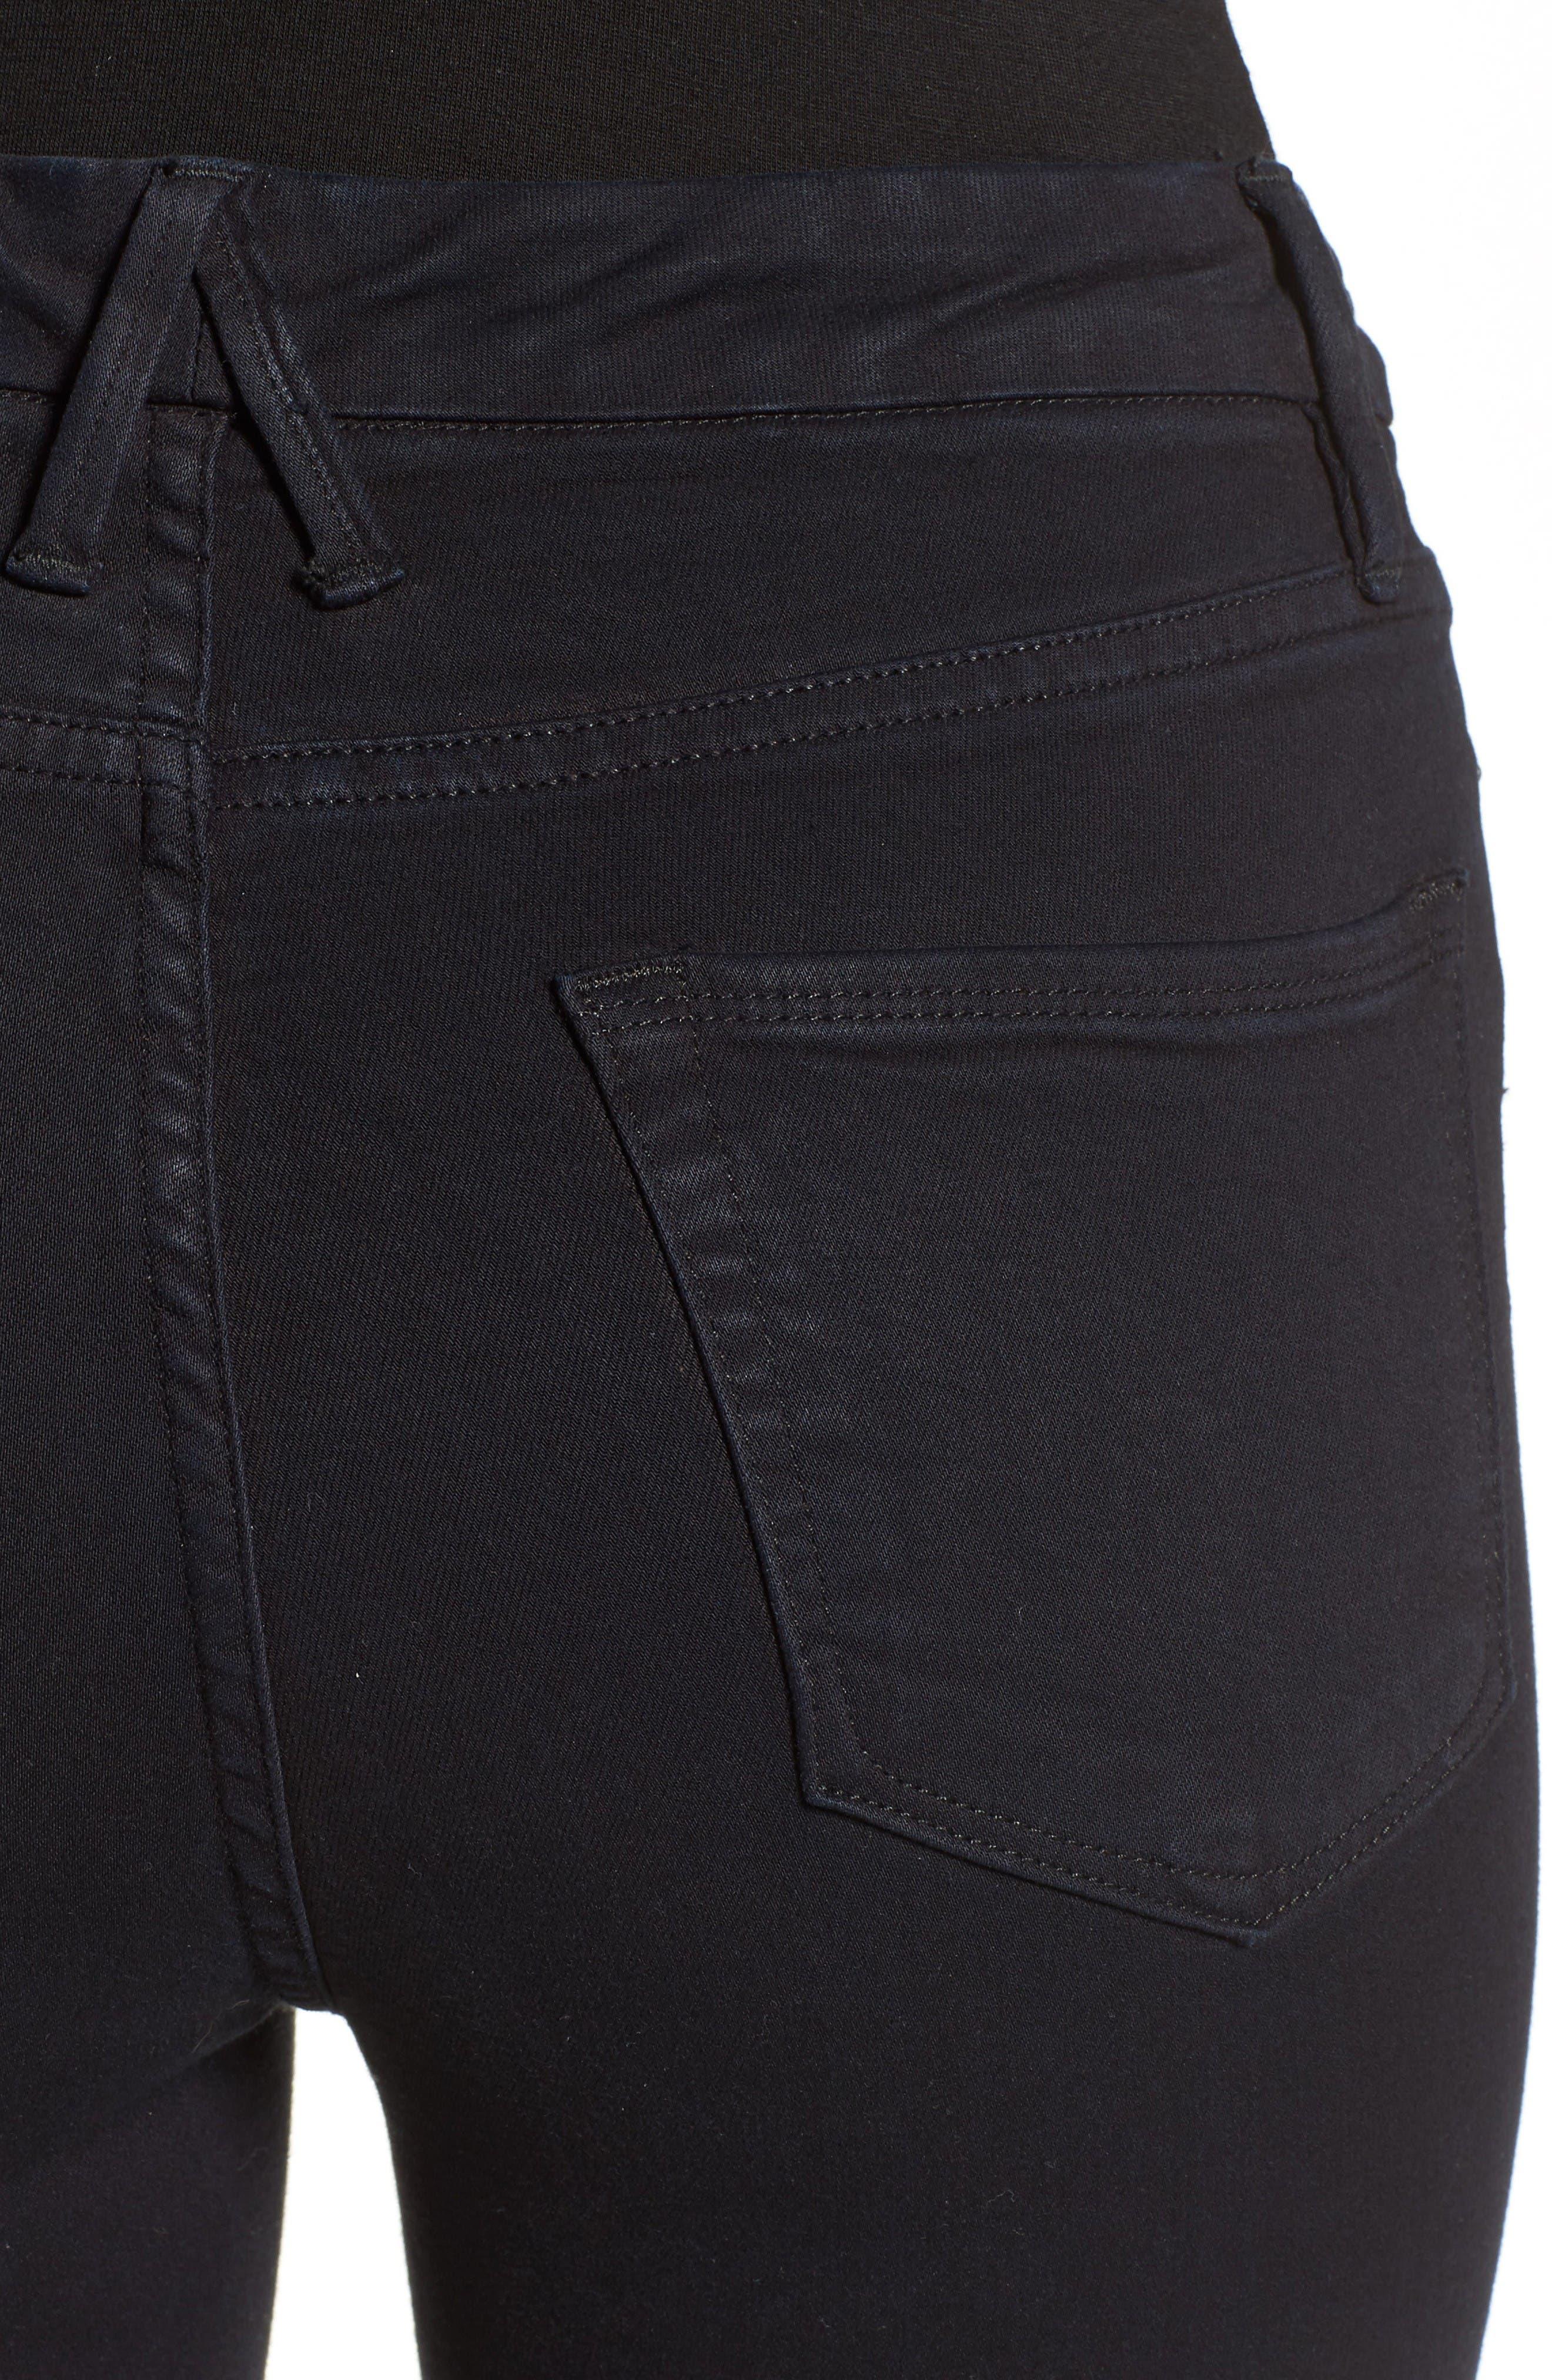 Alternate Image 4  - Good American Good Waist High Rise Skinny Jeans (Black 004)